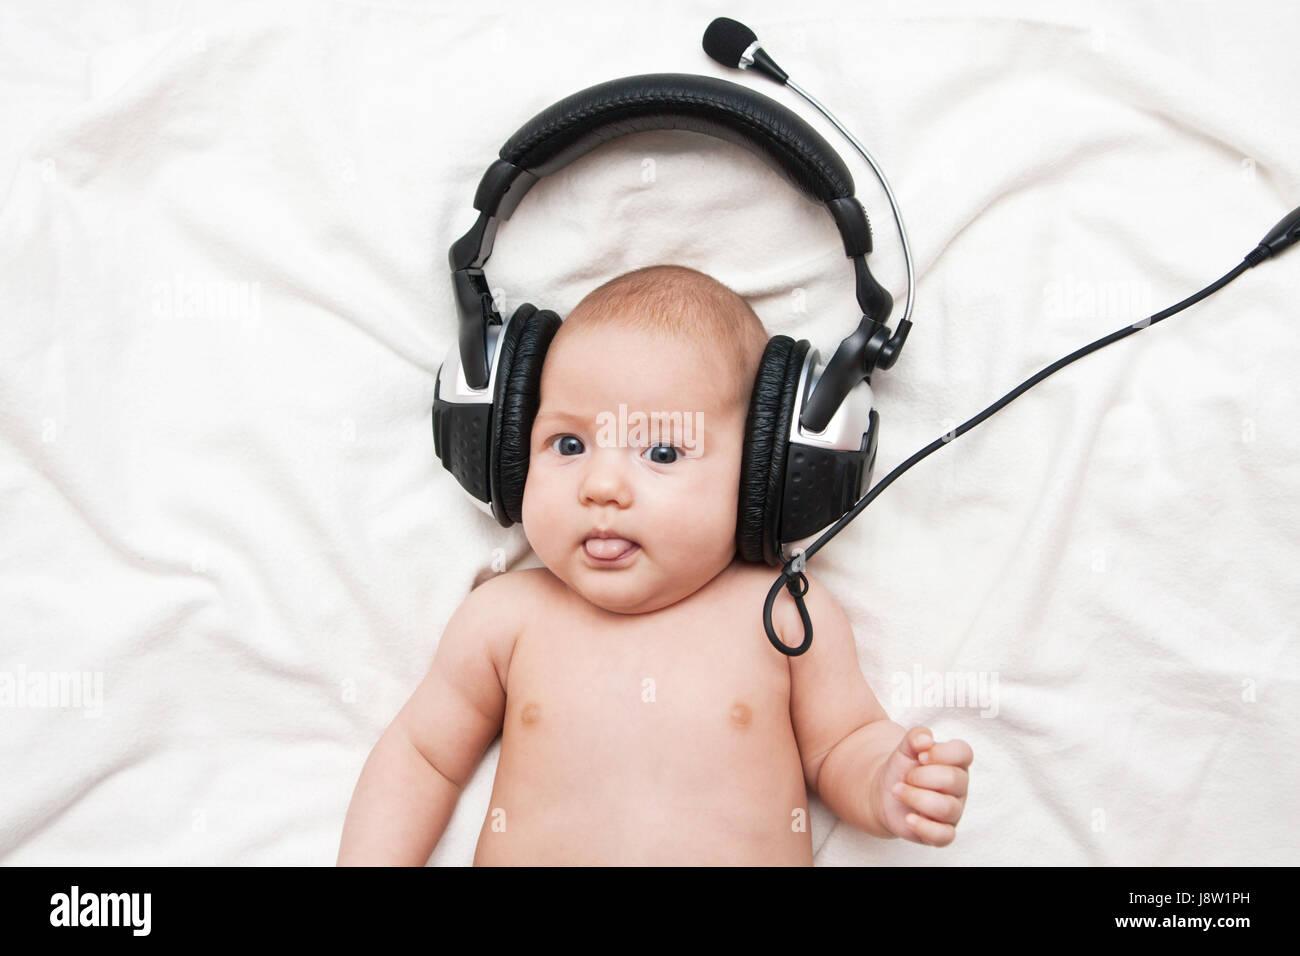 Music Baby Earphones Headphones Adorable Listening Newborn Child Newborn